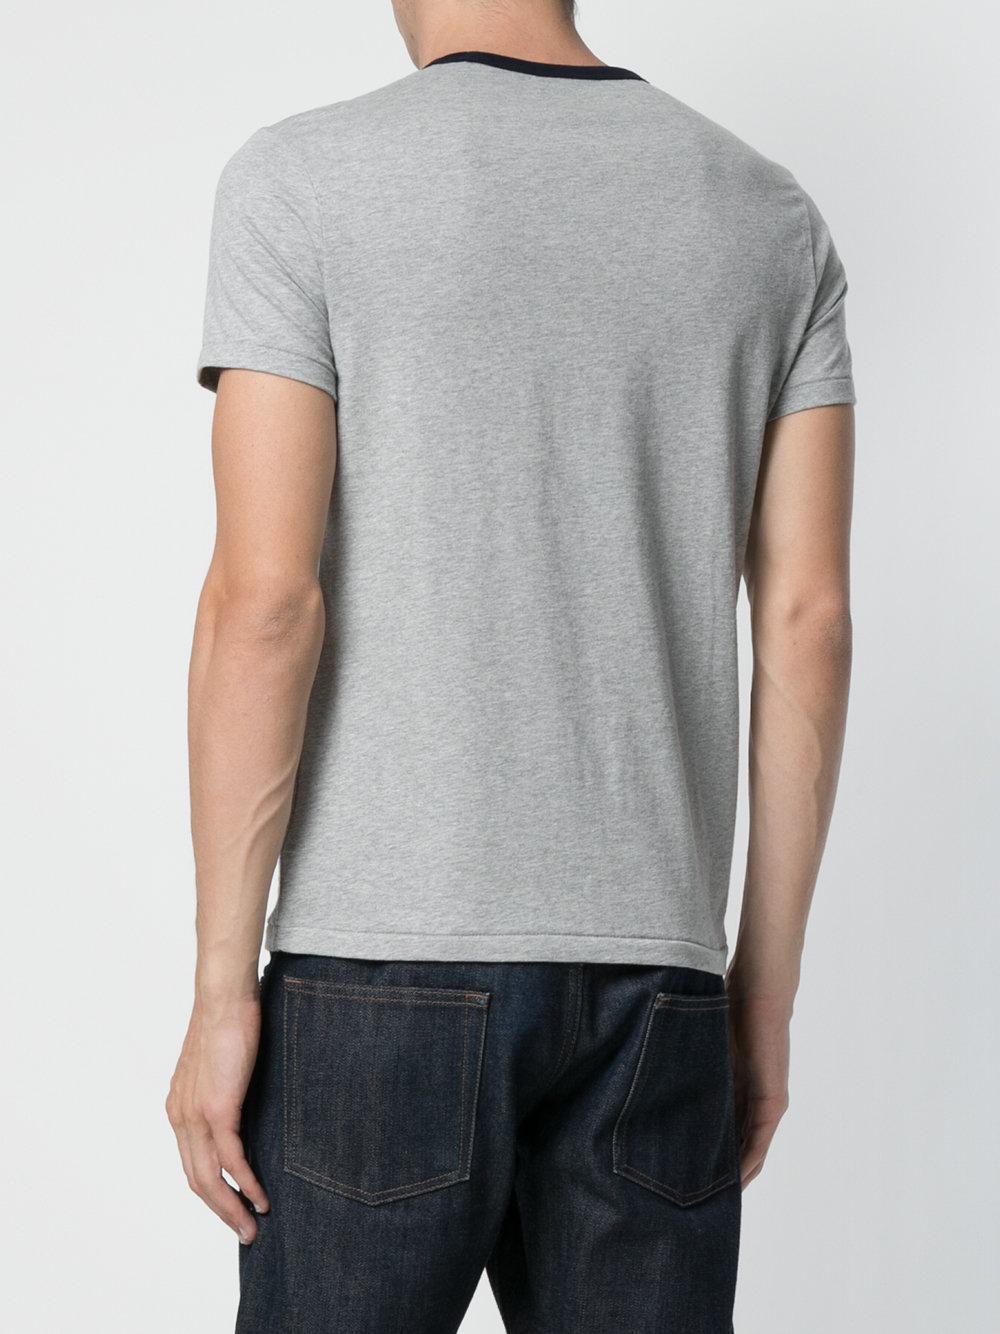 lyst polo ralph lauren logo print t shirt in gray for men. Black Bedroom Furniture Sets. Home Design Ideas